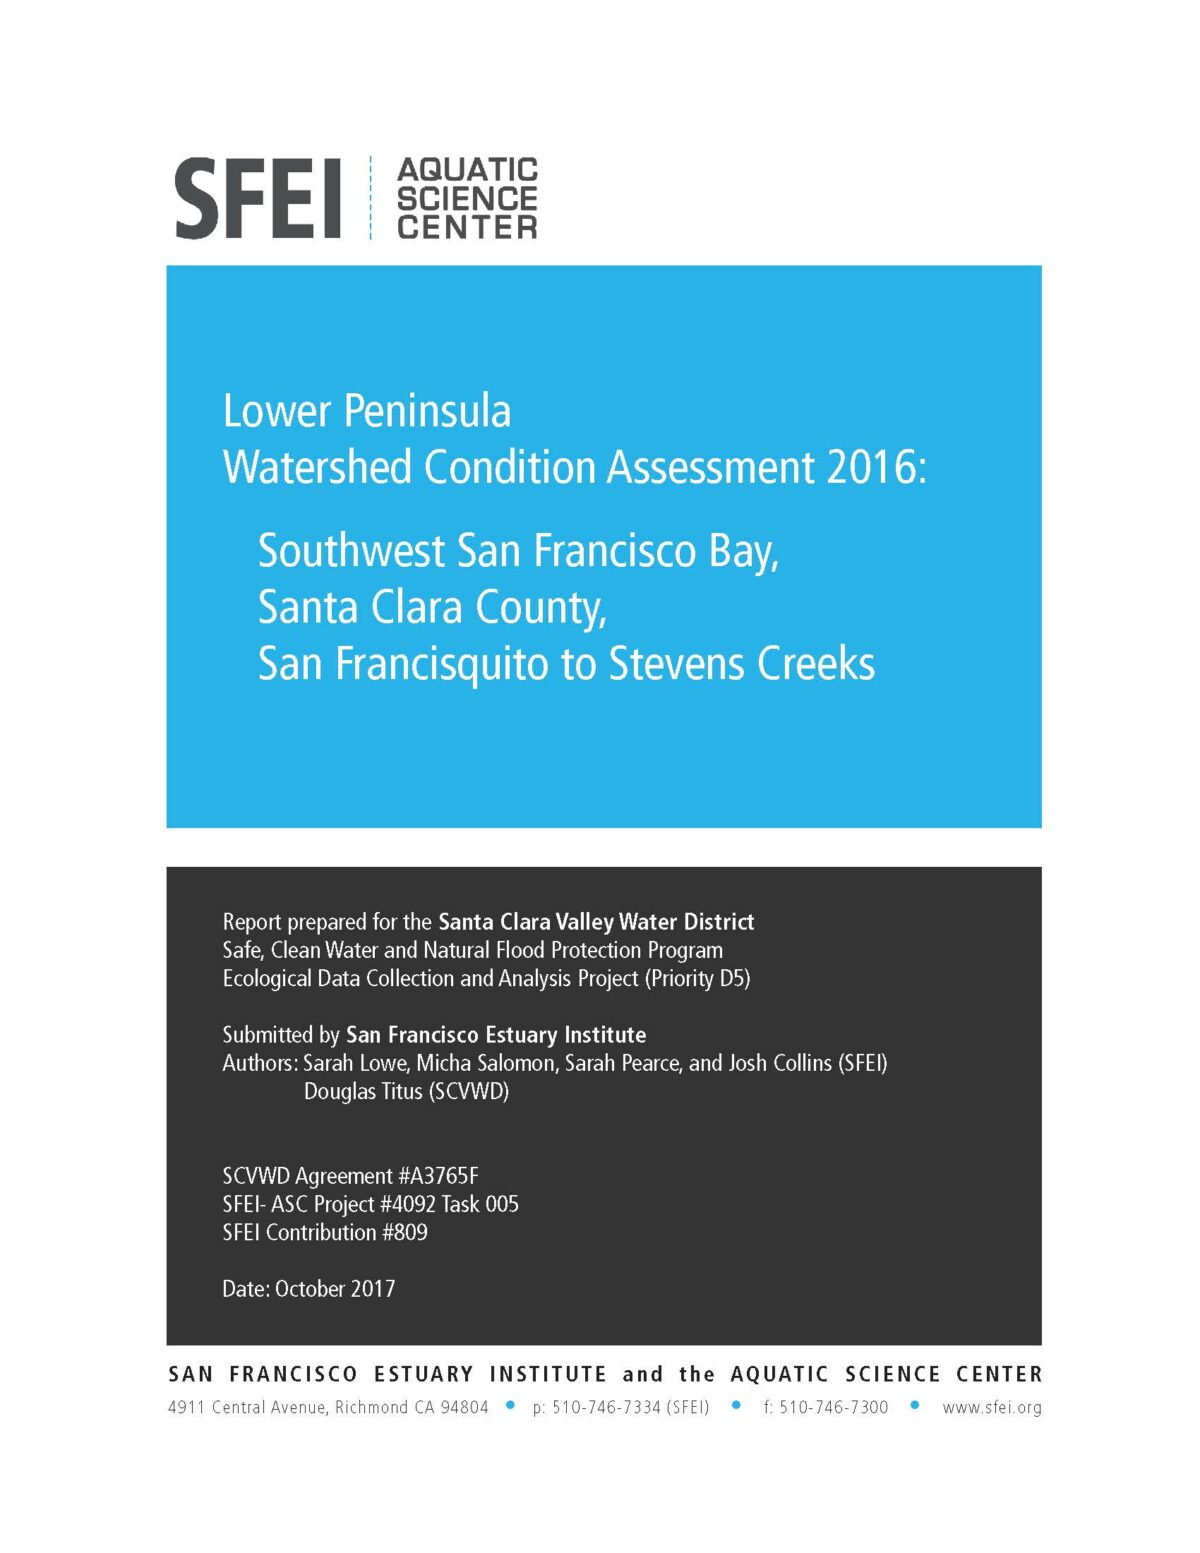 Lower Peninsula Watershed Condition Assessment 2016: Southwest San Francisco Bay, Santa Clara County, San Francisquito to Stevens Creeks. Technical memorandum prepared for the Santa Clara Valley Water District